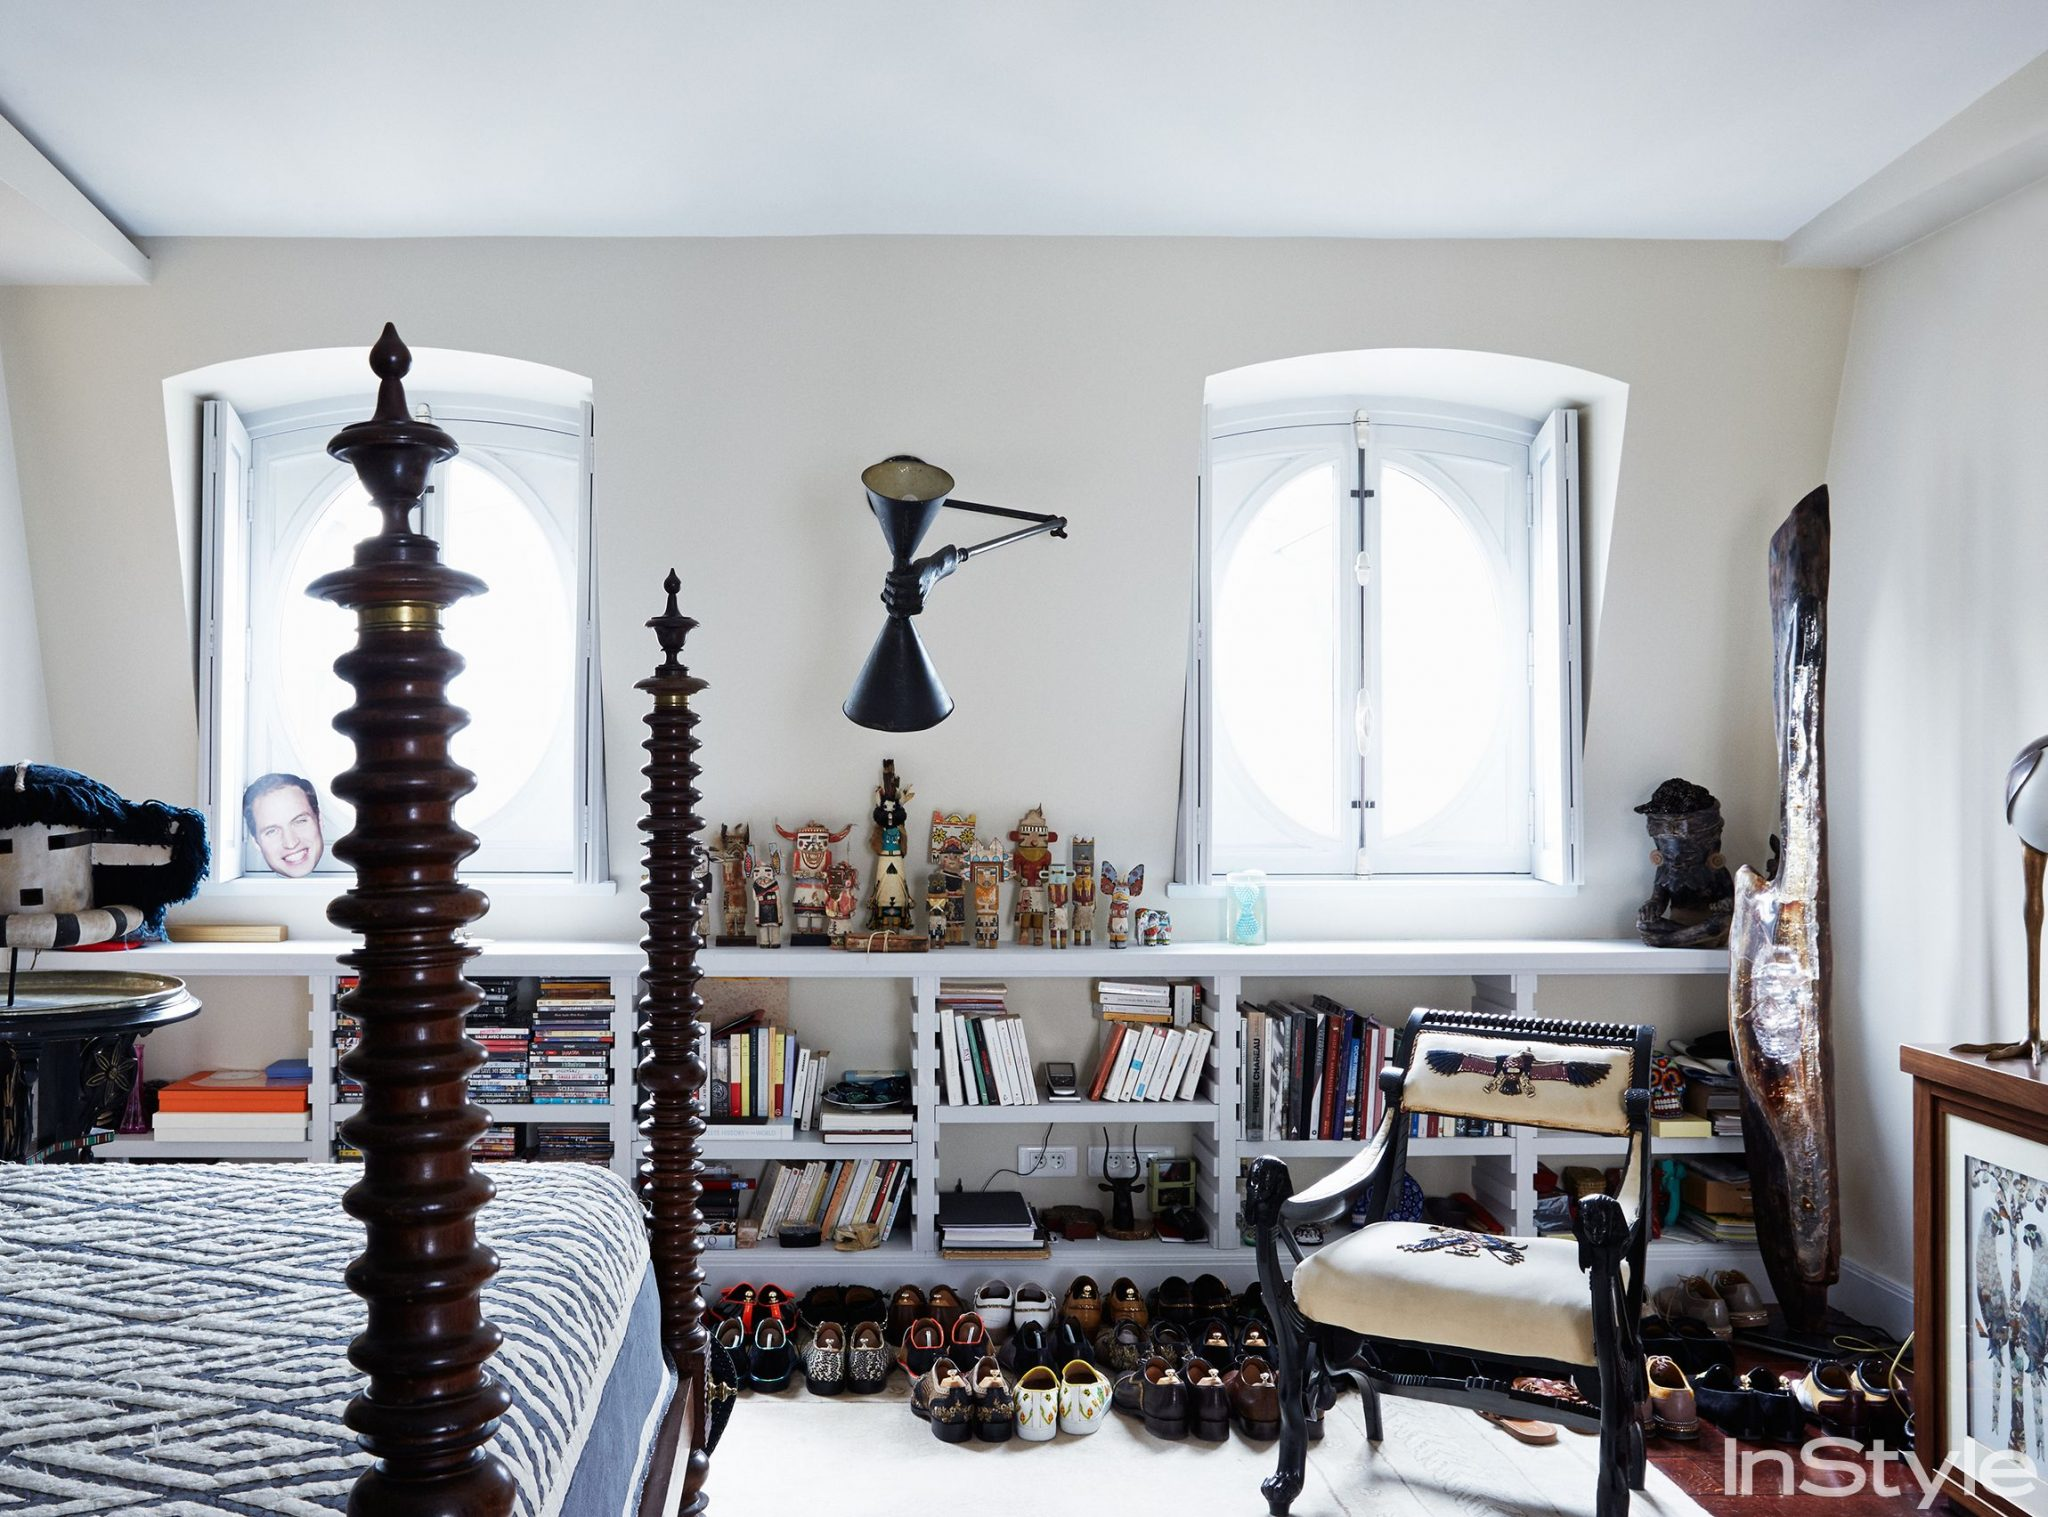 Christian Louboutin's Luxuxy Penthouse Designed By Jacques Grange